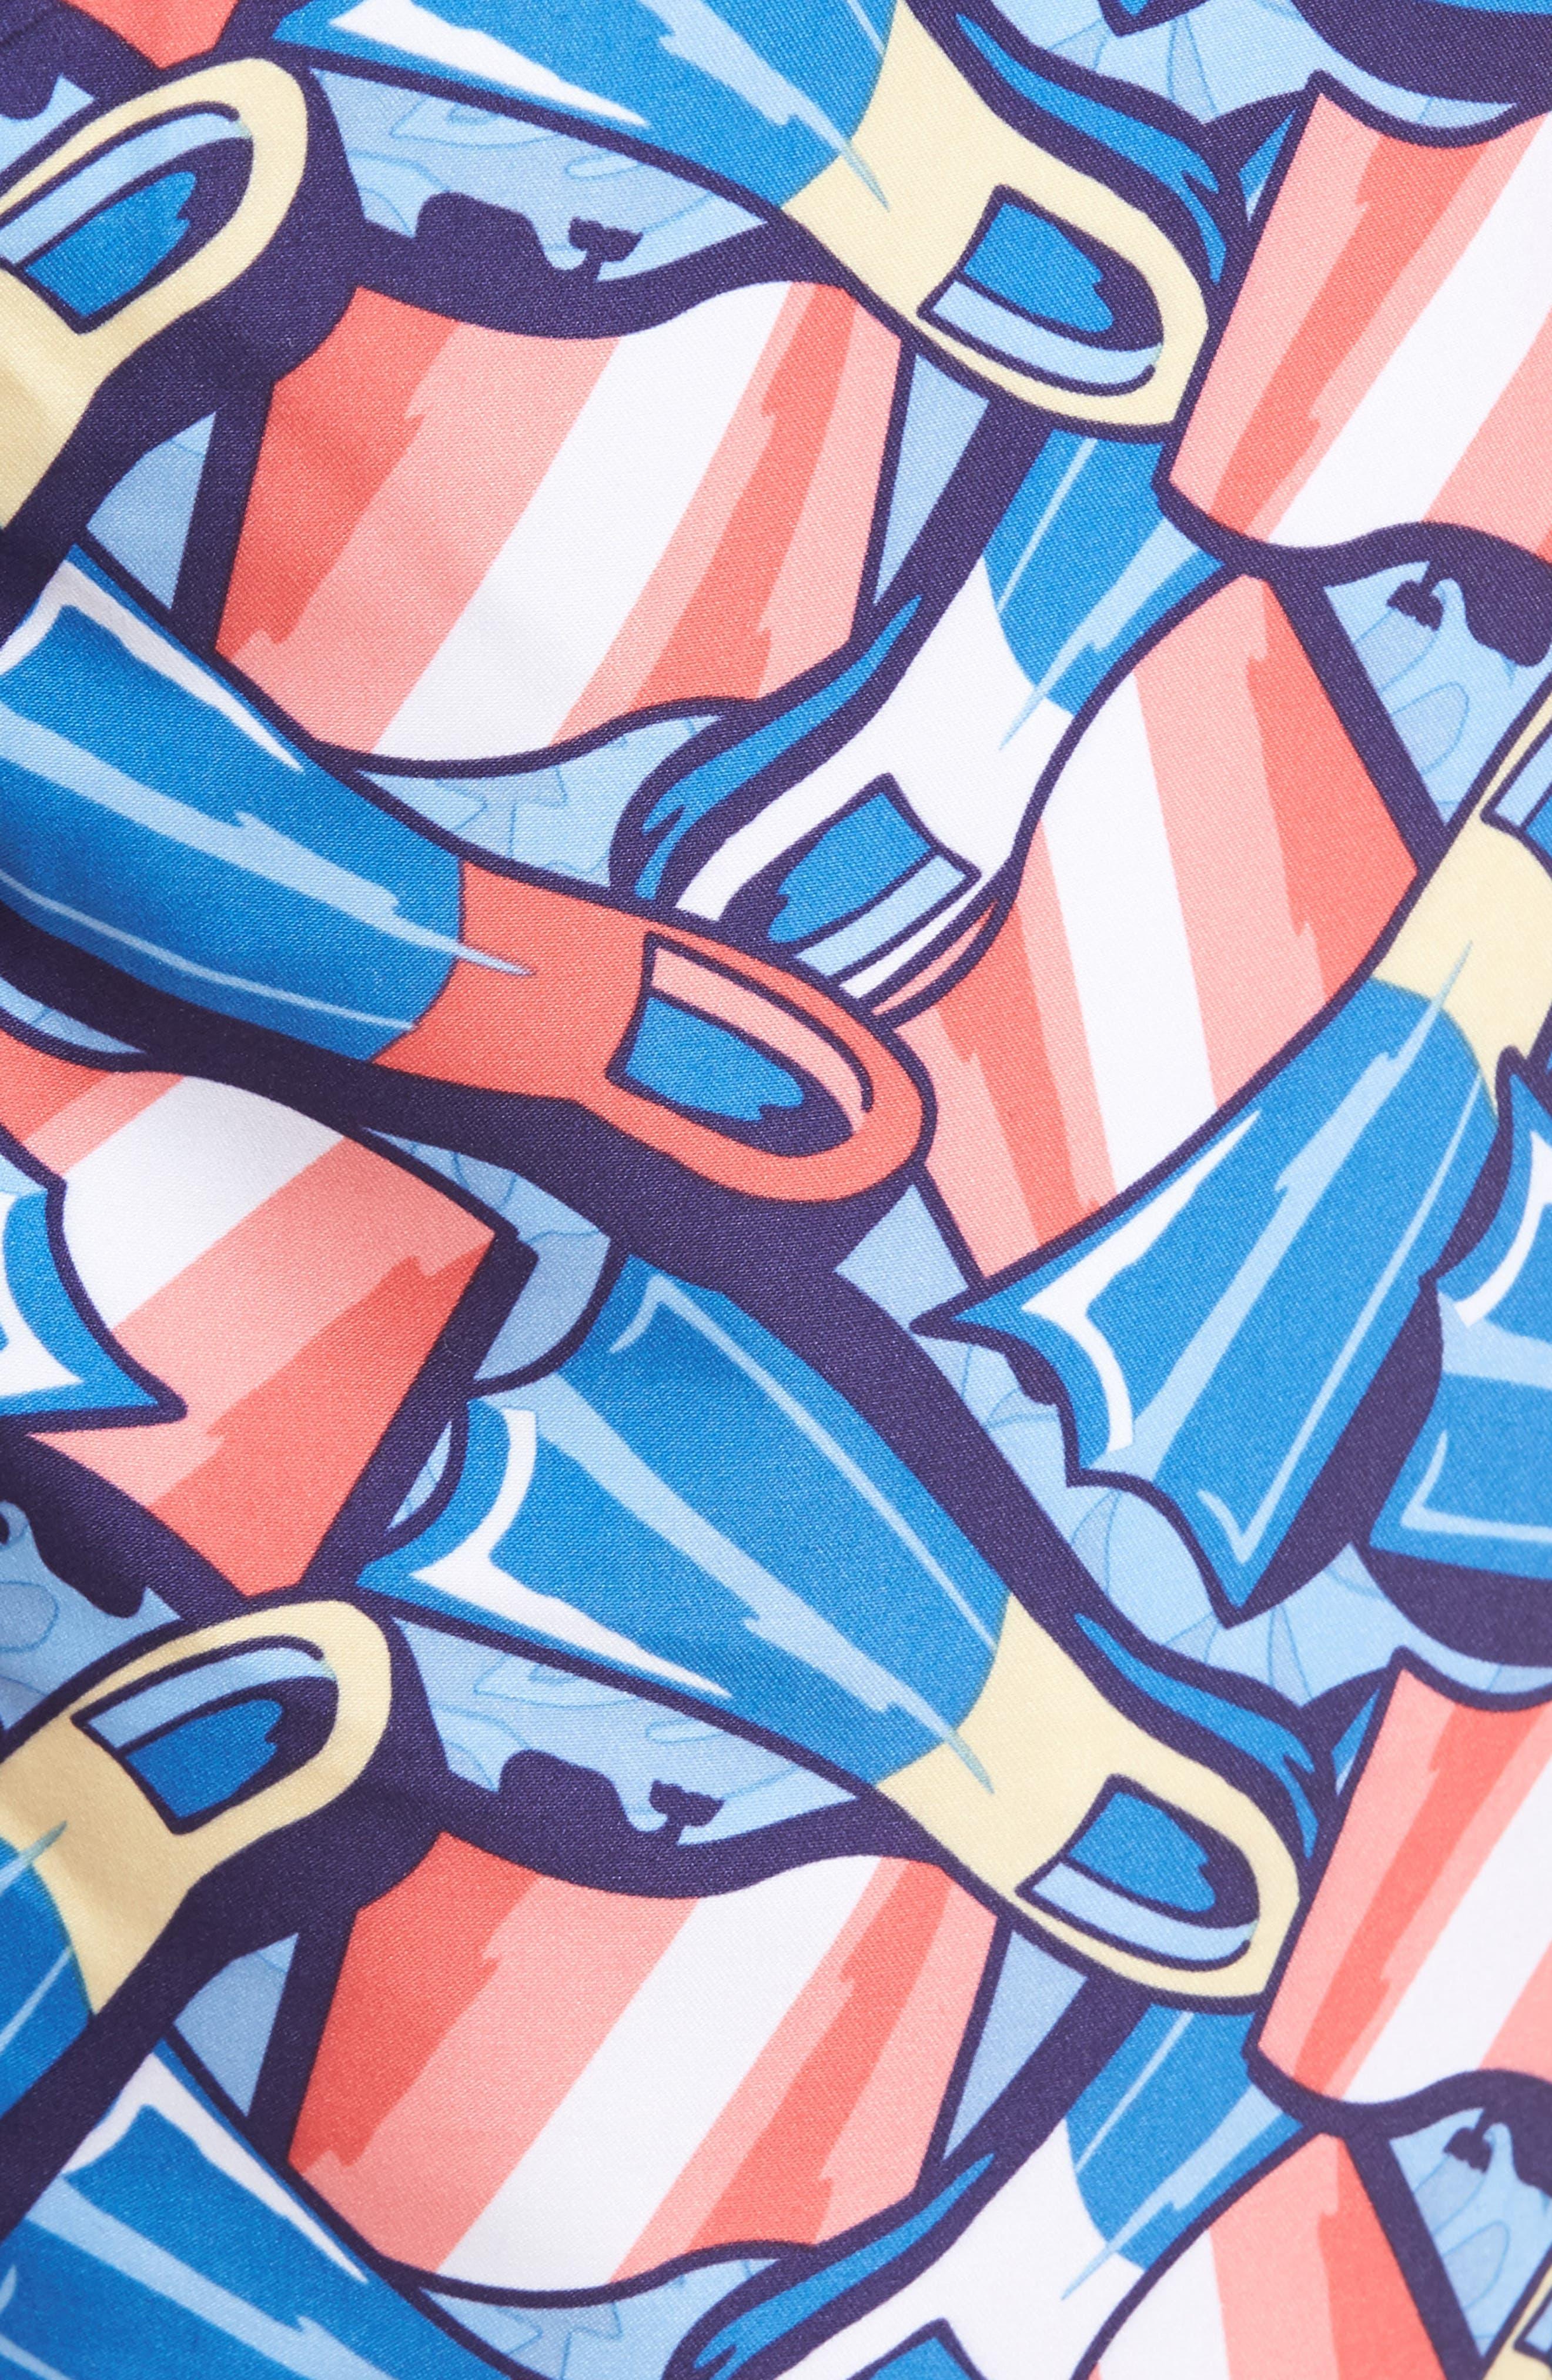 Flippers Chappy Swim Trunks,                             Alternate thumbnail 5, color,                             Dockside Blue